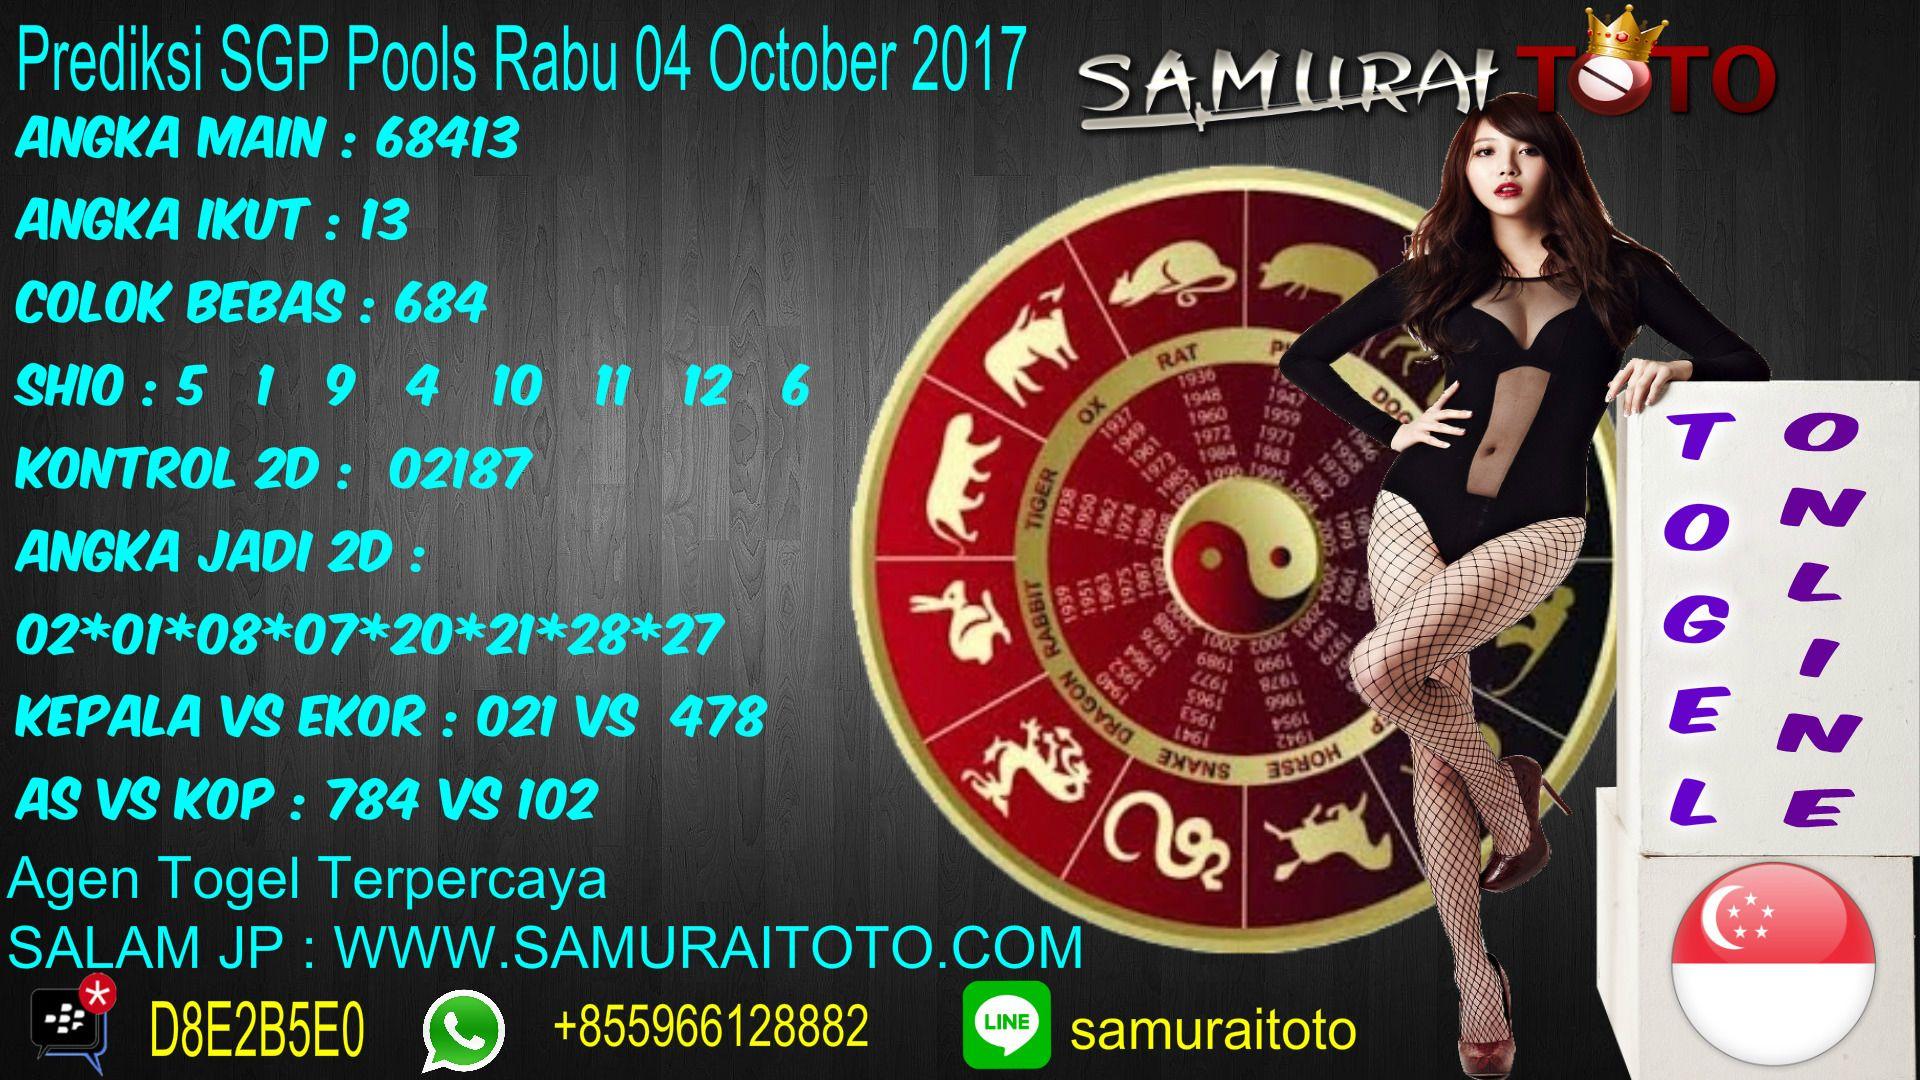 Prediksi Togel SGP Pools Rabu 04 October 2017 Angka Main